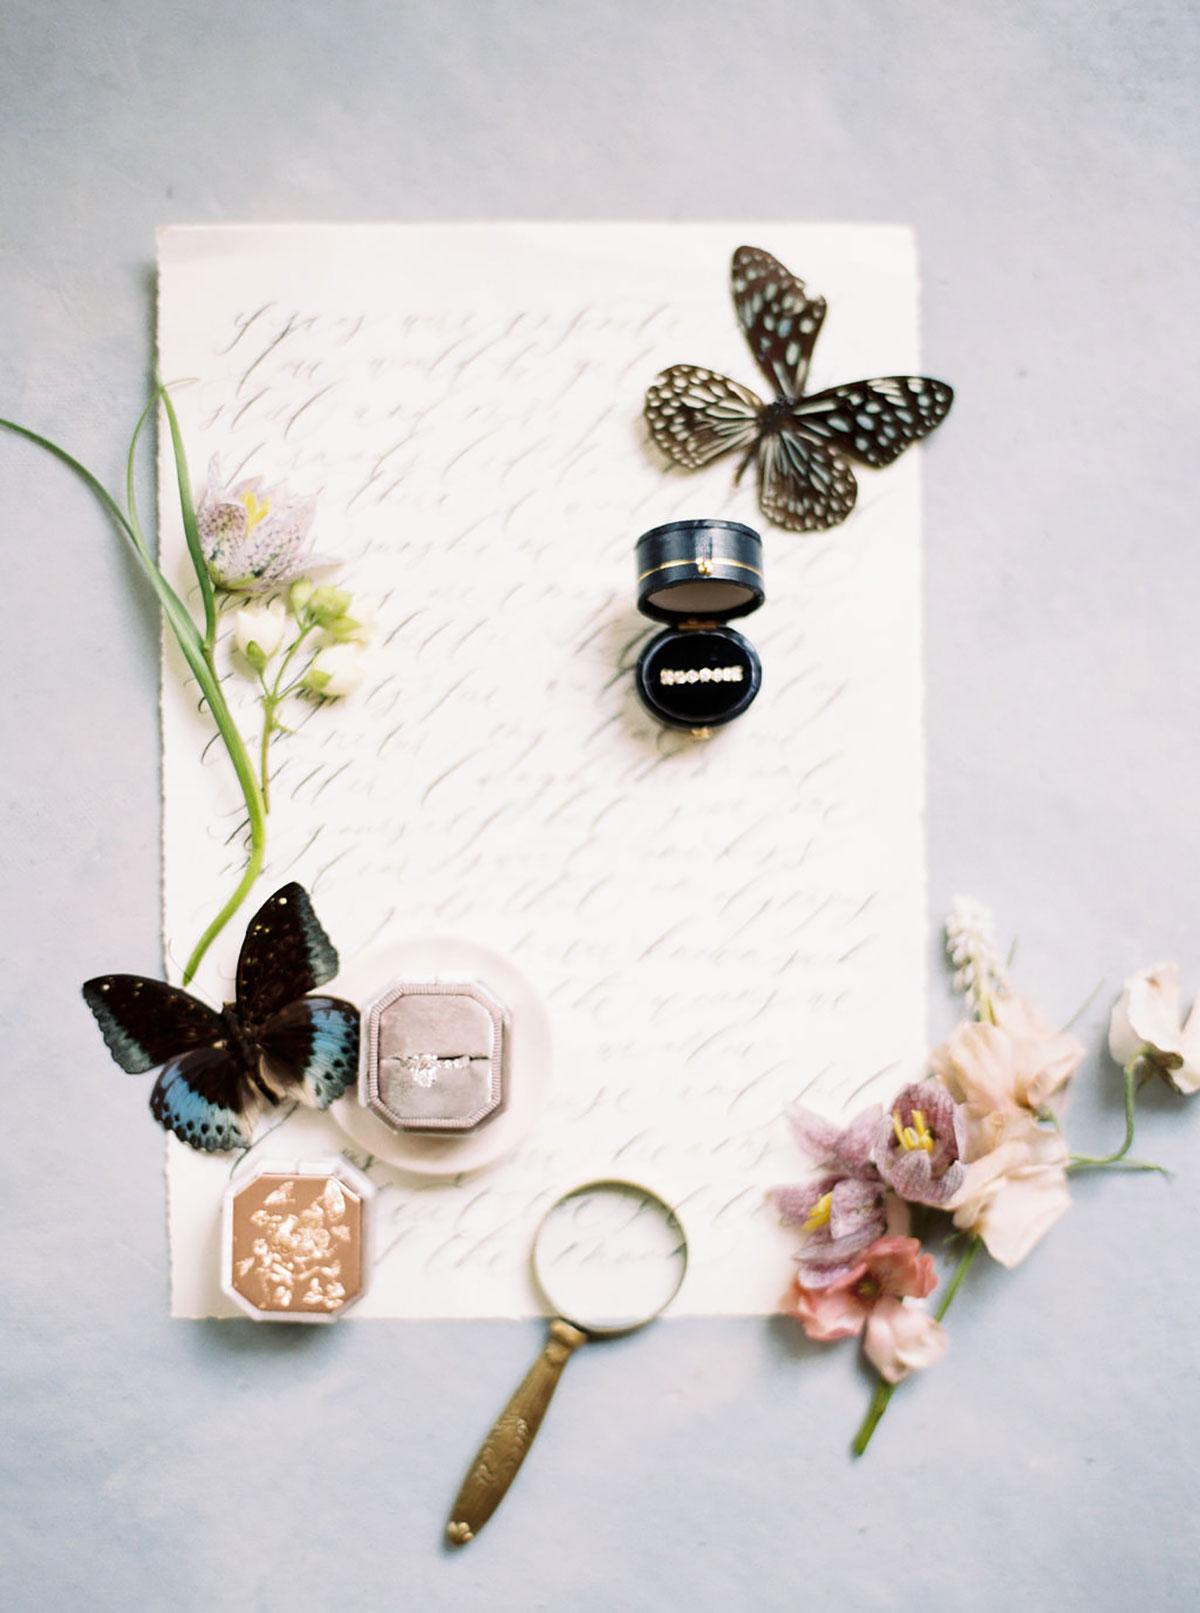 sourced-co-jade-magnolia-flat-lay-styling-workshop-9.jpg